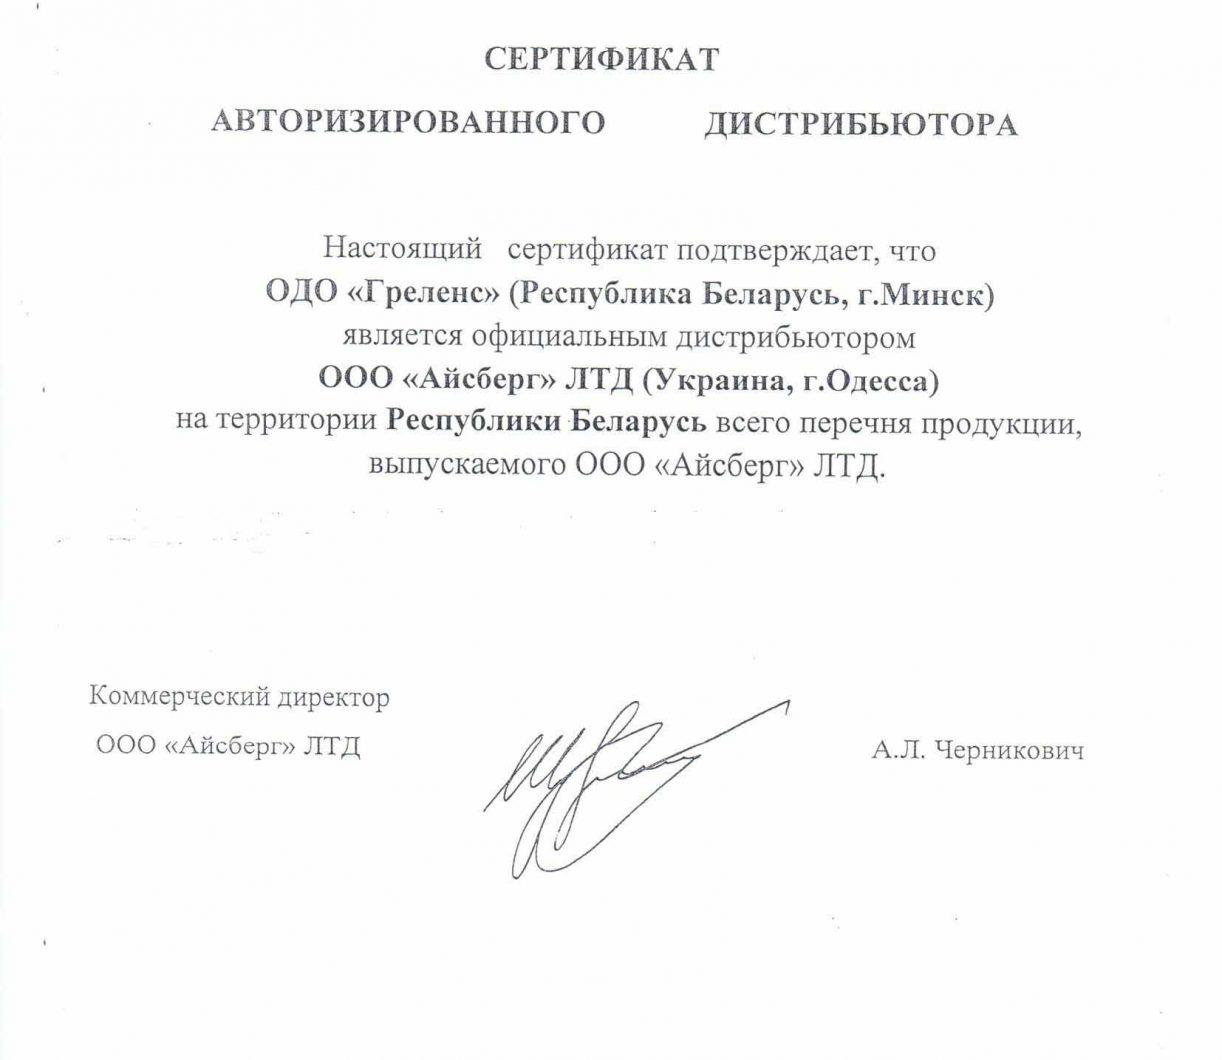 Сертификат АЙСБЕРГА